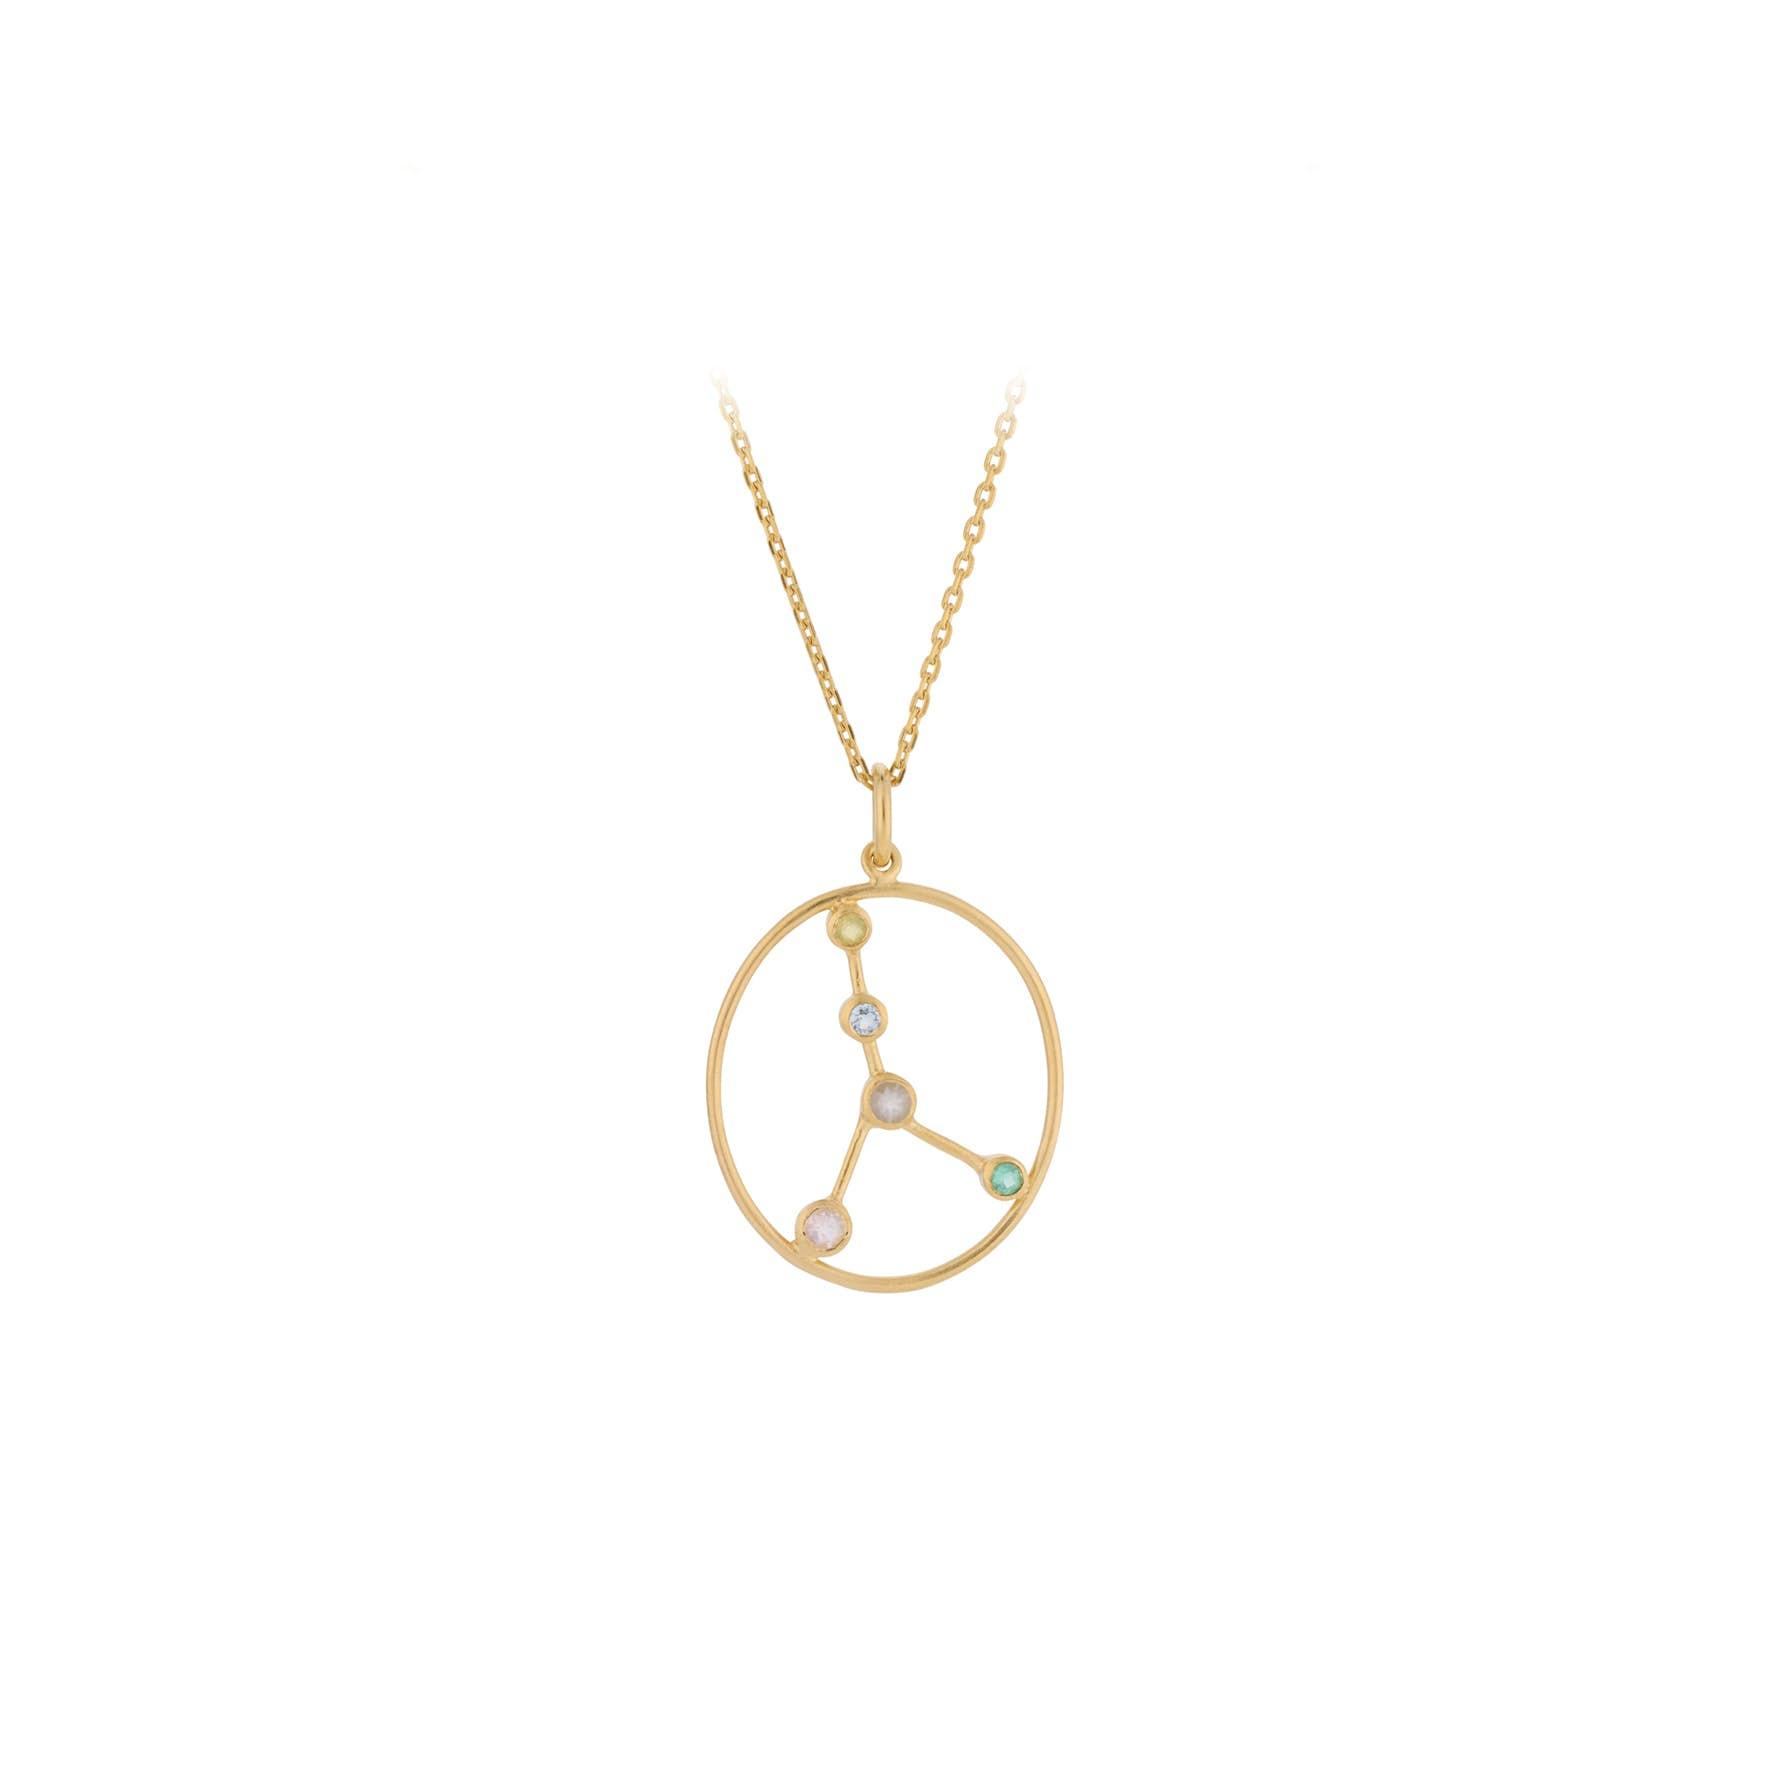 Zodiac Cancer Necklace (Jun 22 - Jul 21) von Pernille Corydon in Vergoldet-Silber Sterling 925